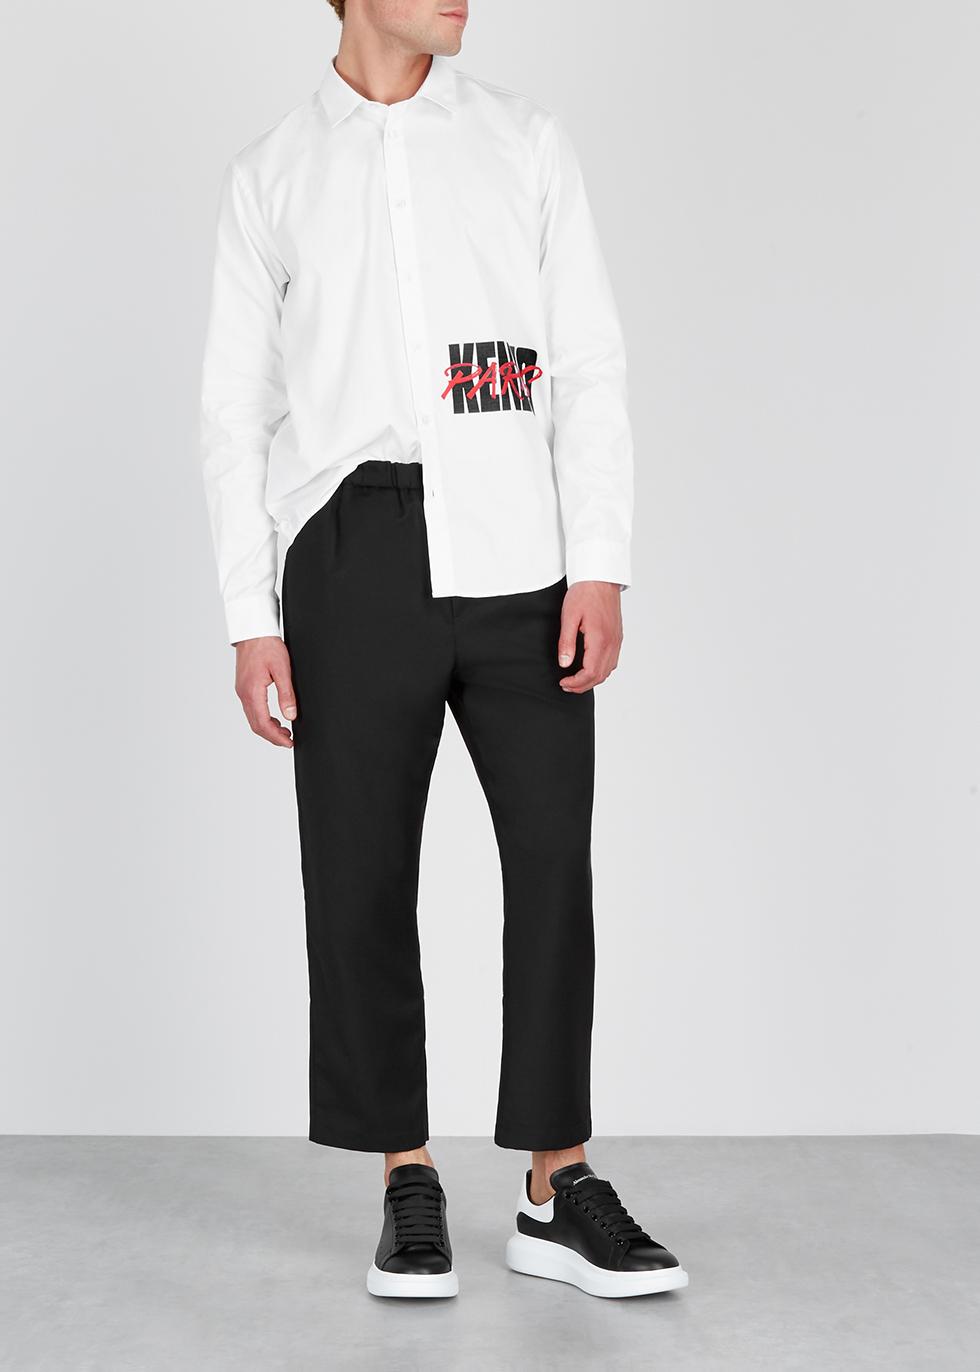 White logo-print cotton shirt - Kenzo